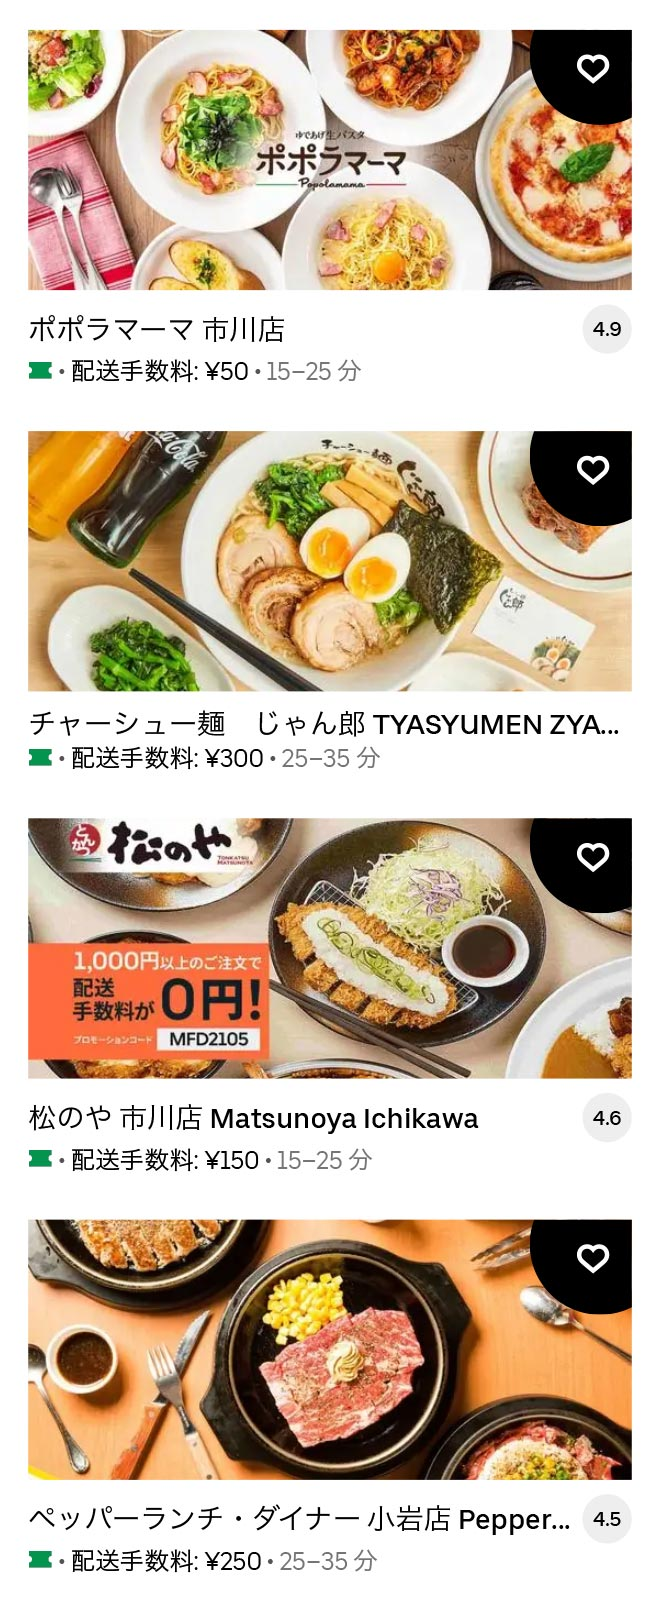 U ichikawa 2105 07